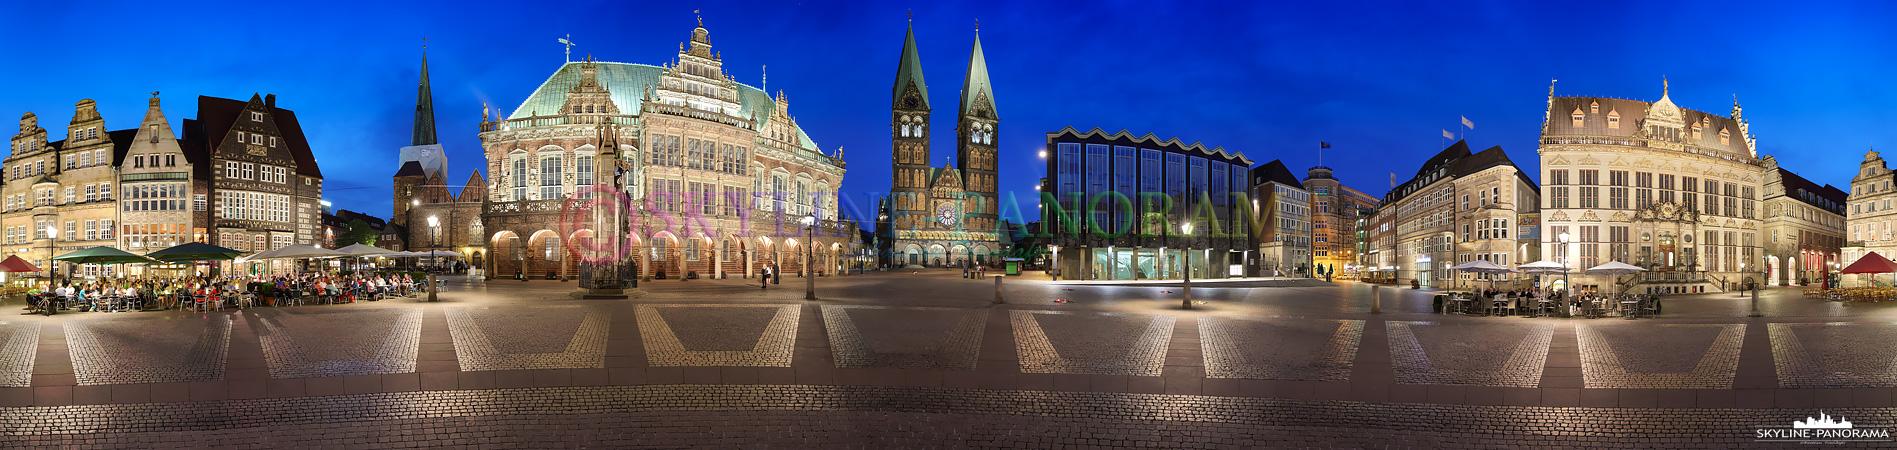 Panorama Bremer Marktplatz